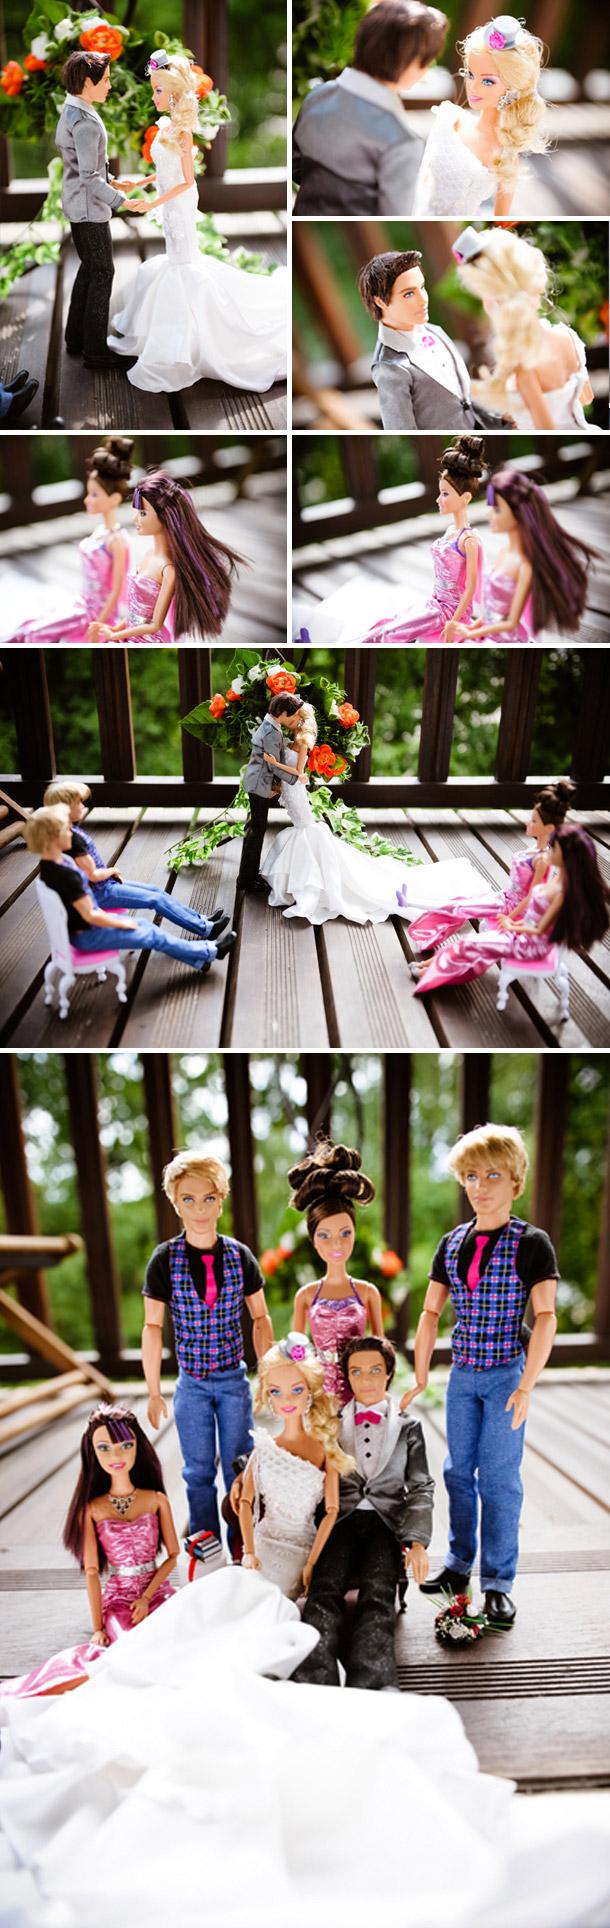 Barbie und Kens Hochzeitsinspiration bei Béatrice de Guigné